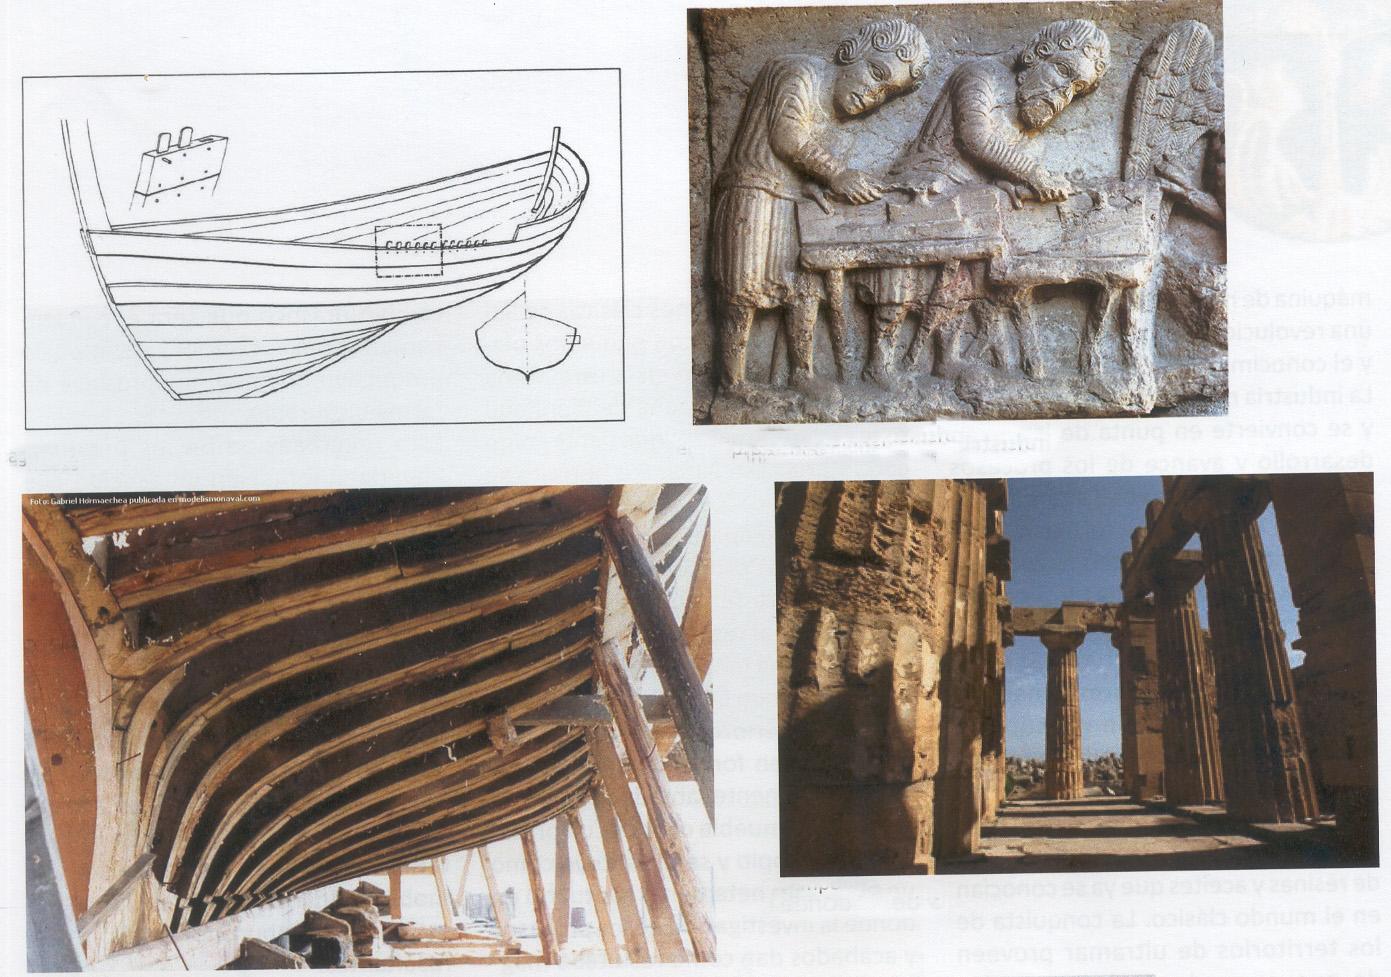 Madera Artesanos muebles carpinteros